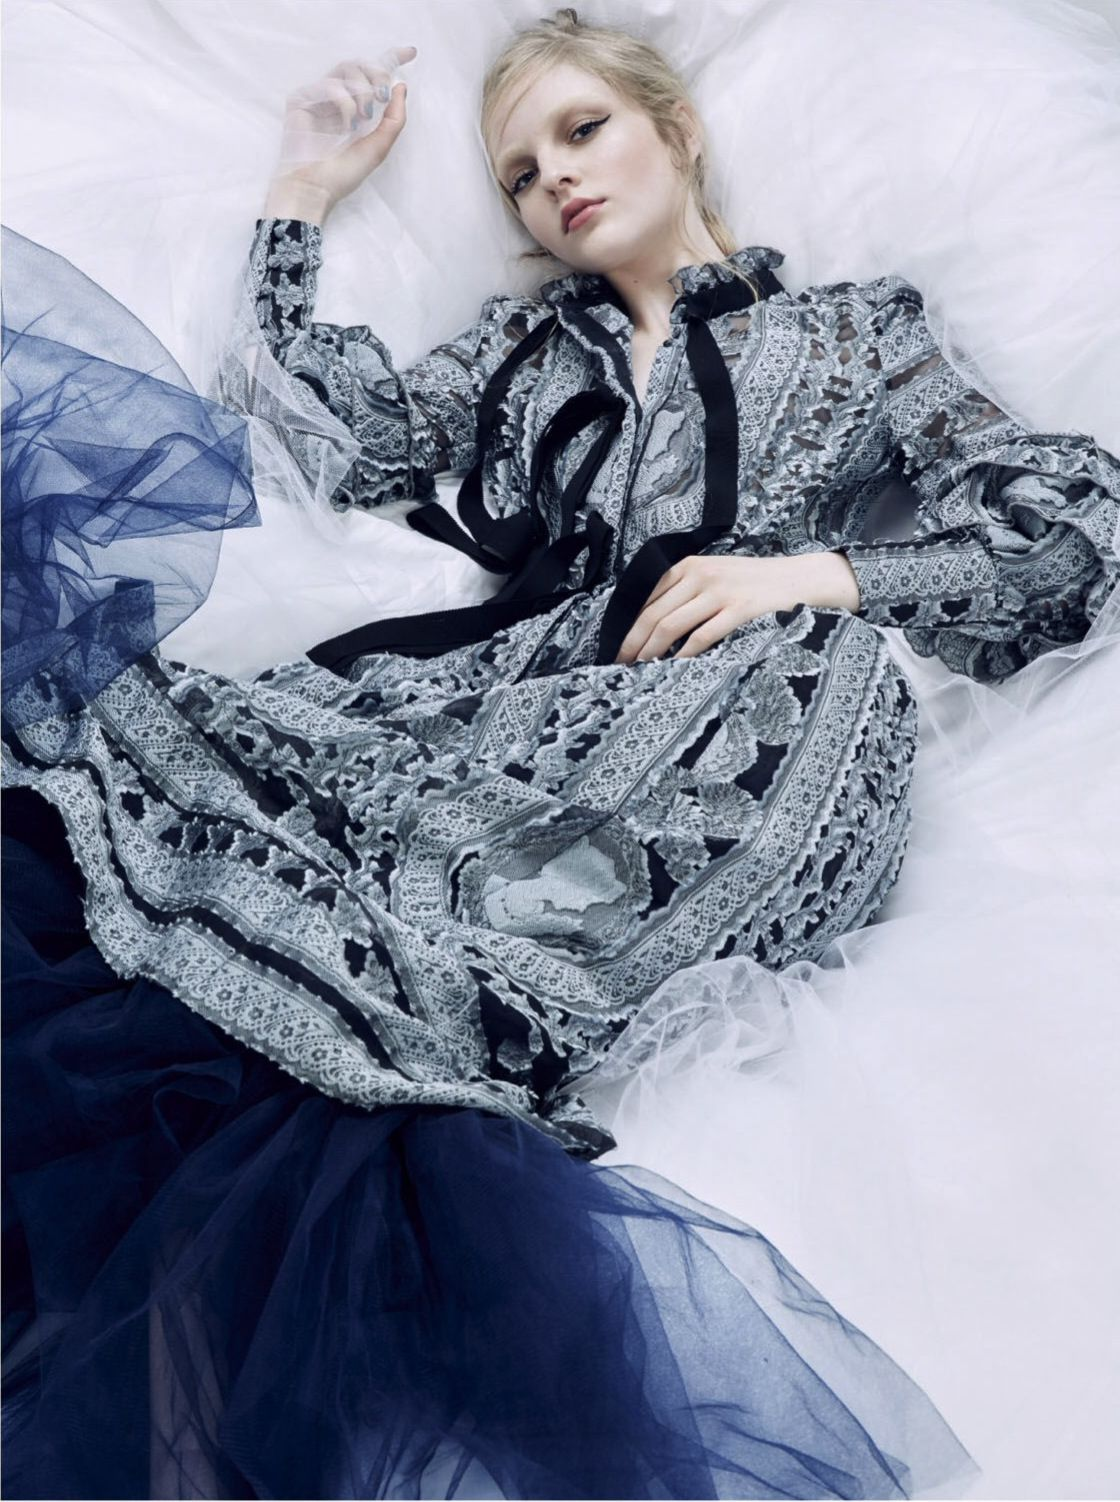 Skewed Lady - Olivia Hamilton by Kai Z Feng for Elle UK March 2016